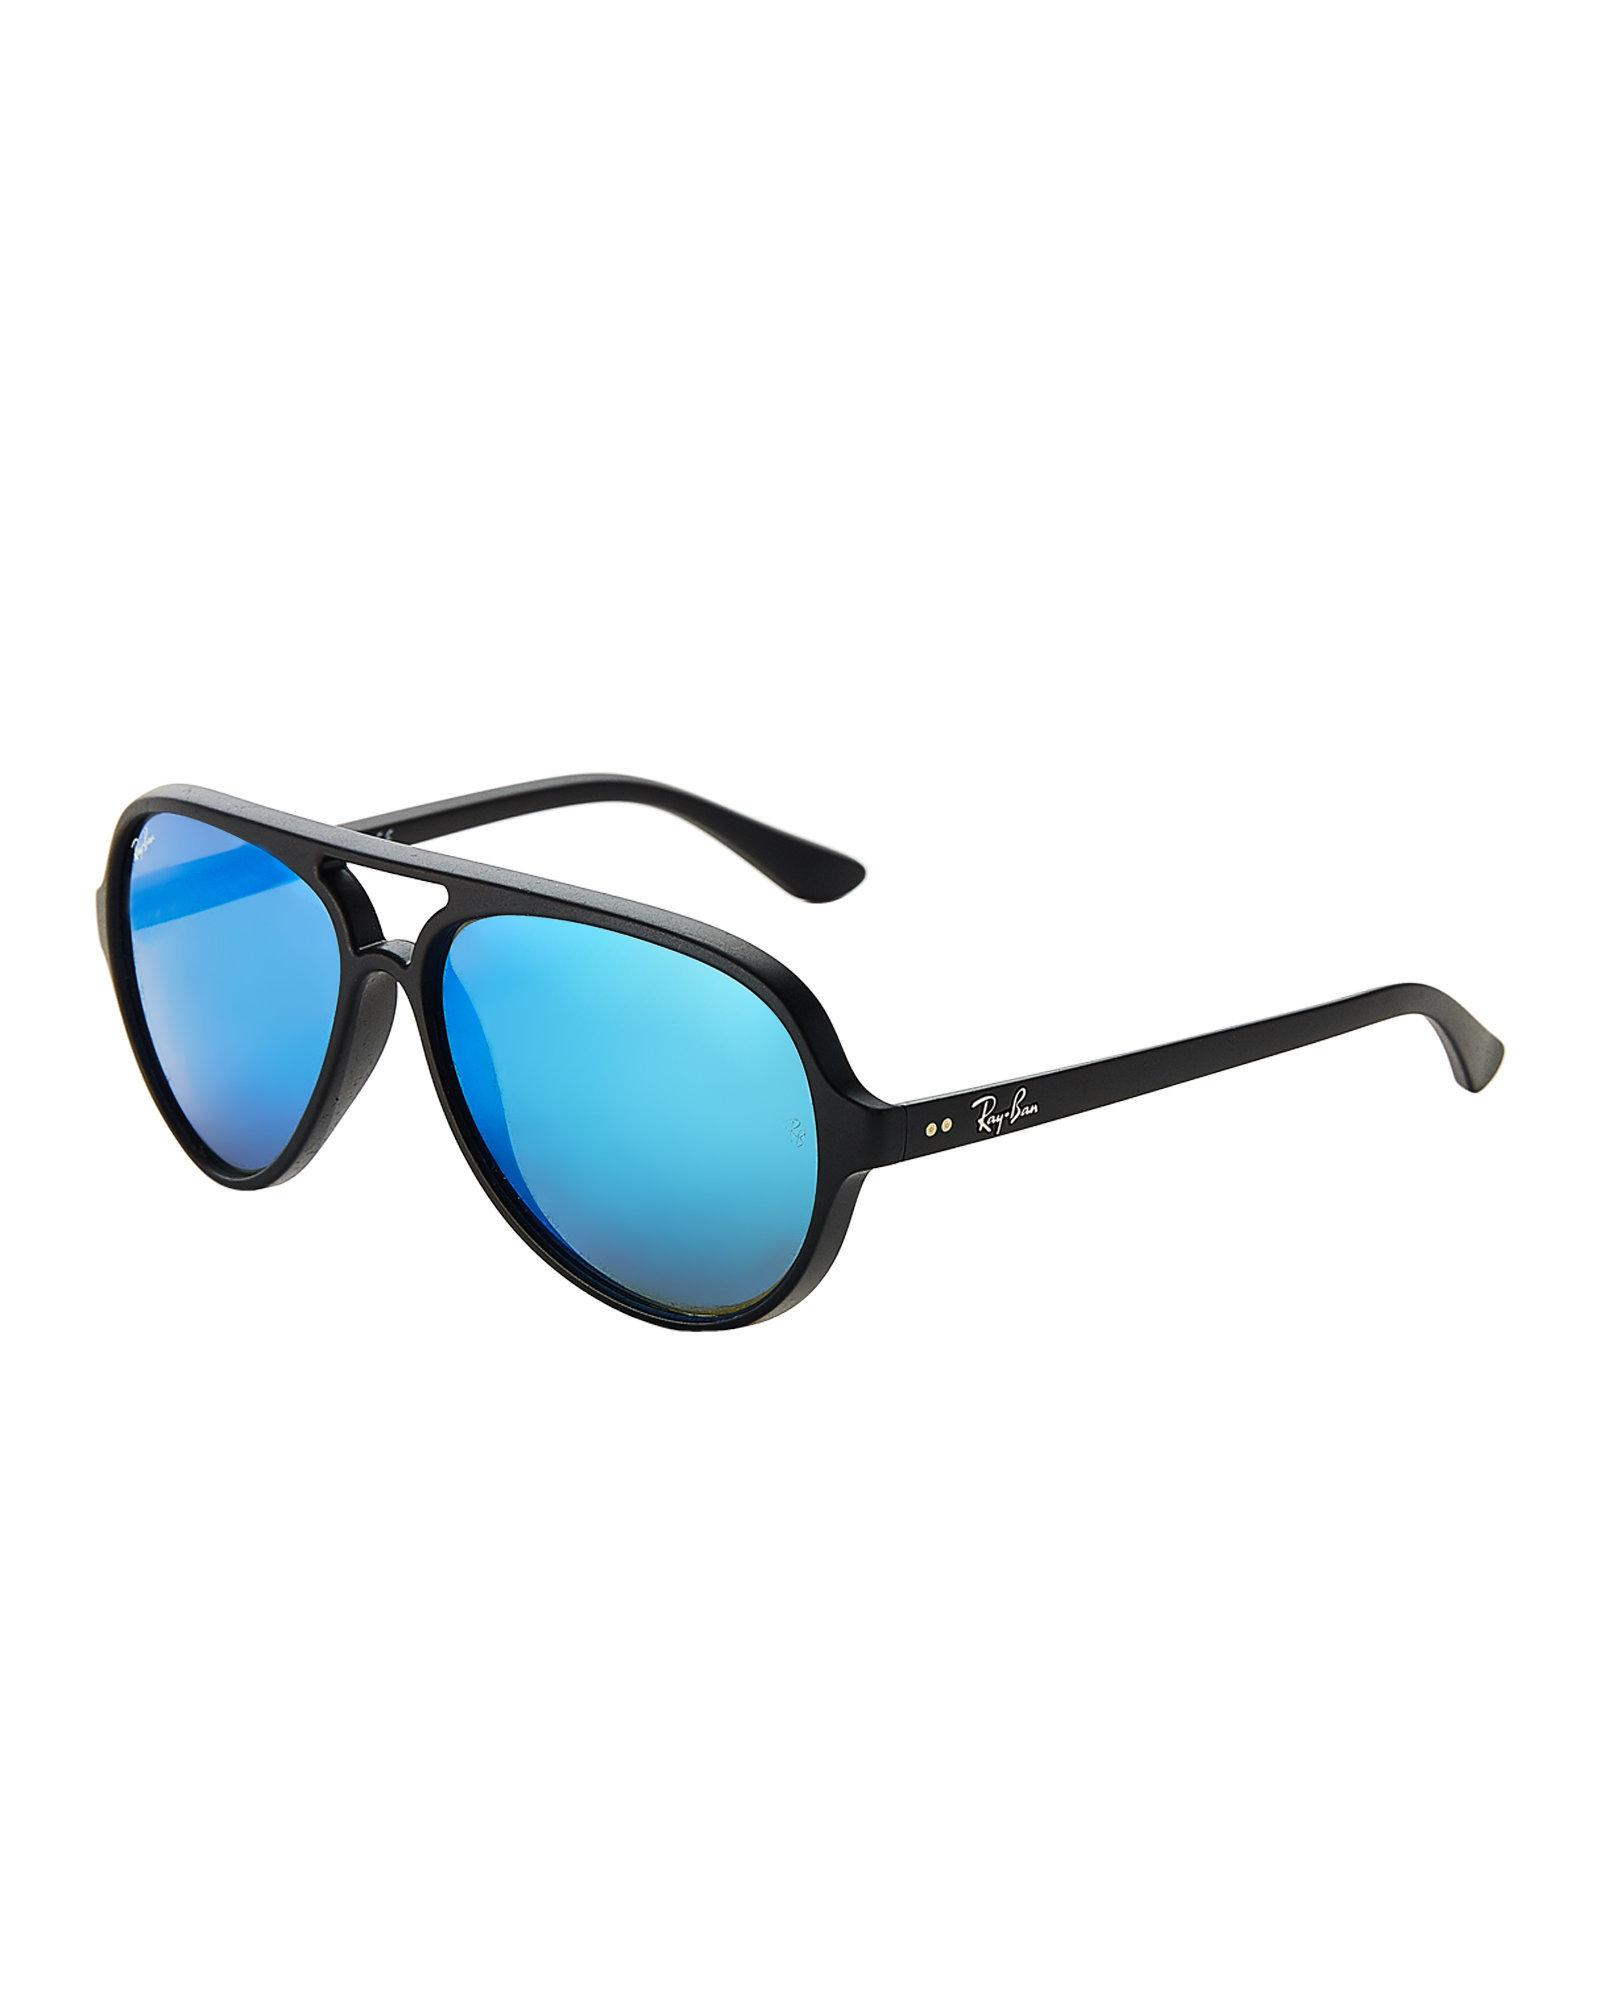 20900d4d3d Lyst - Ray-Ban Rb4125 Black Aviator Sunglasses in Black for Men